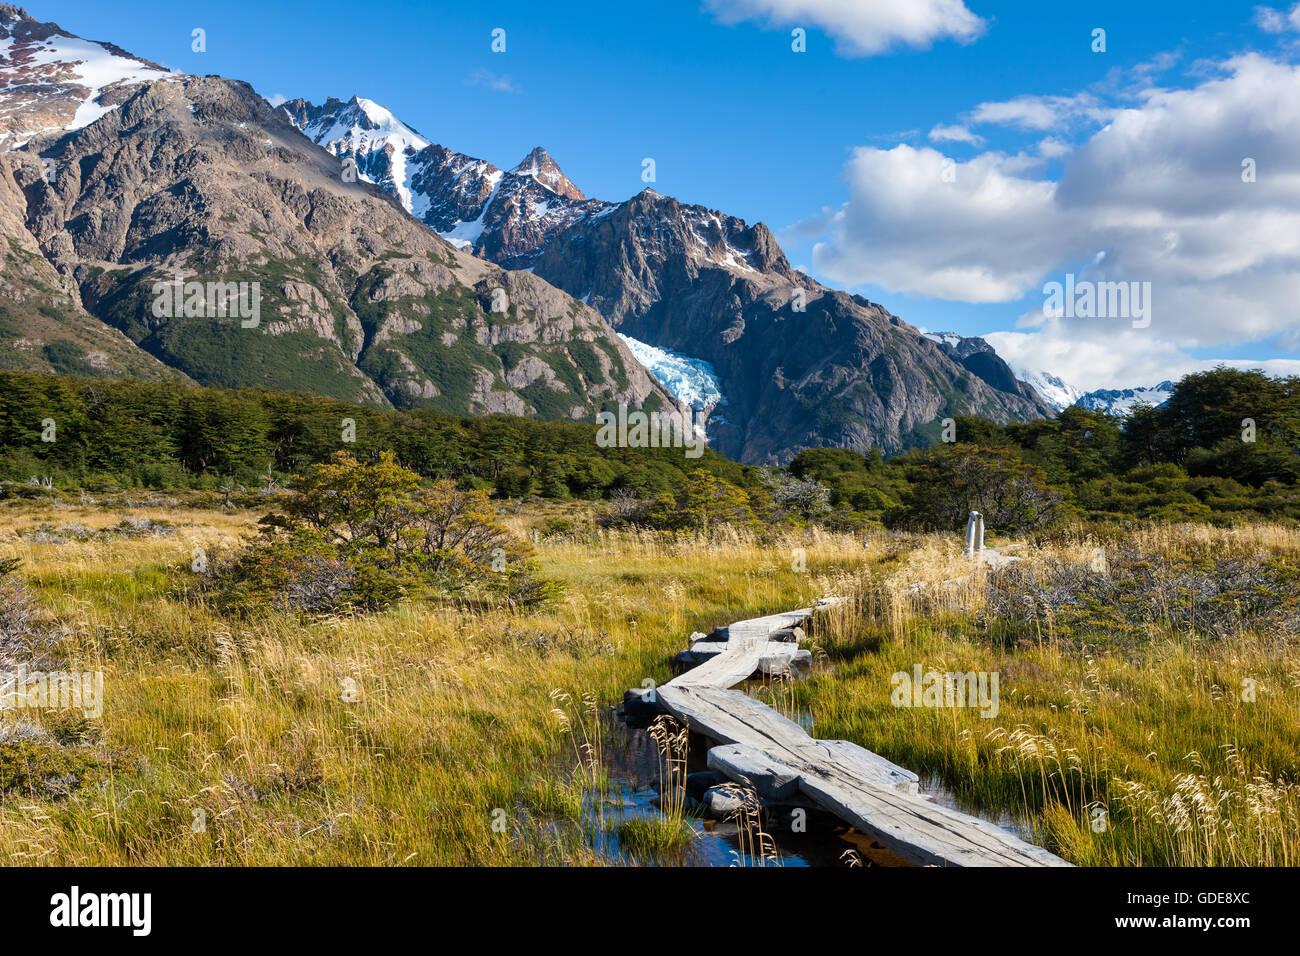 Patagonia,nature,Argentina - Stock Image